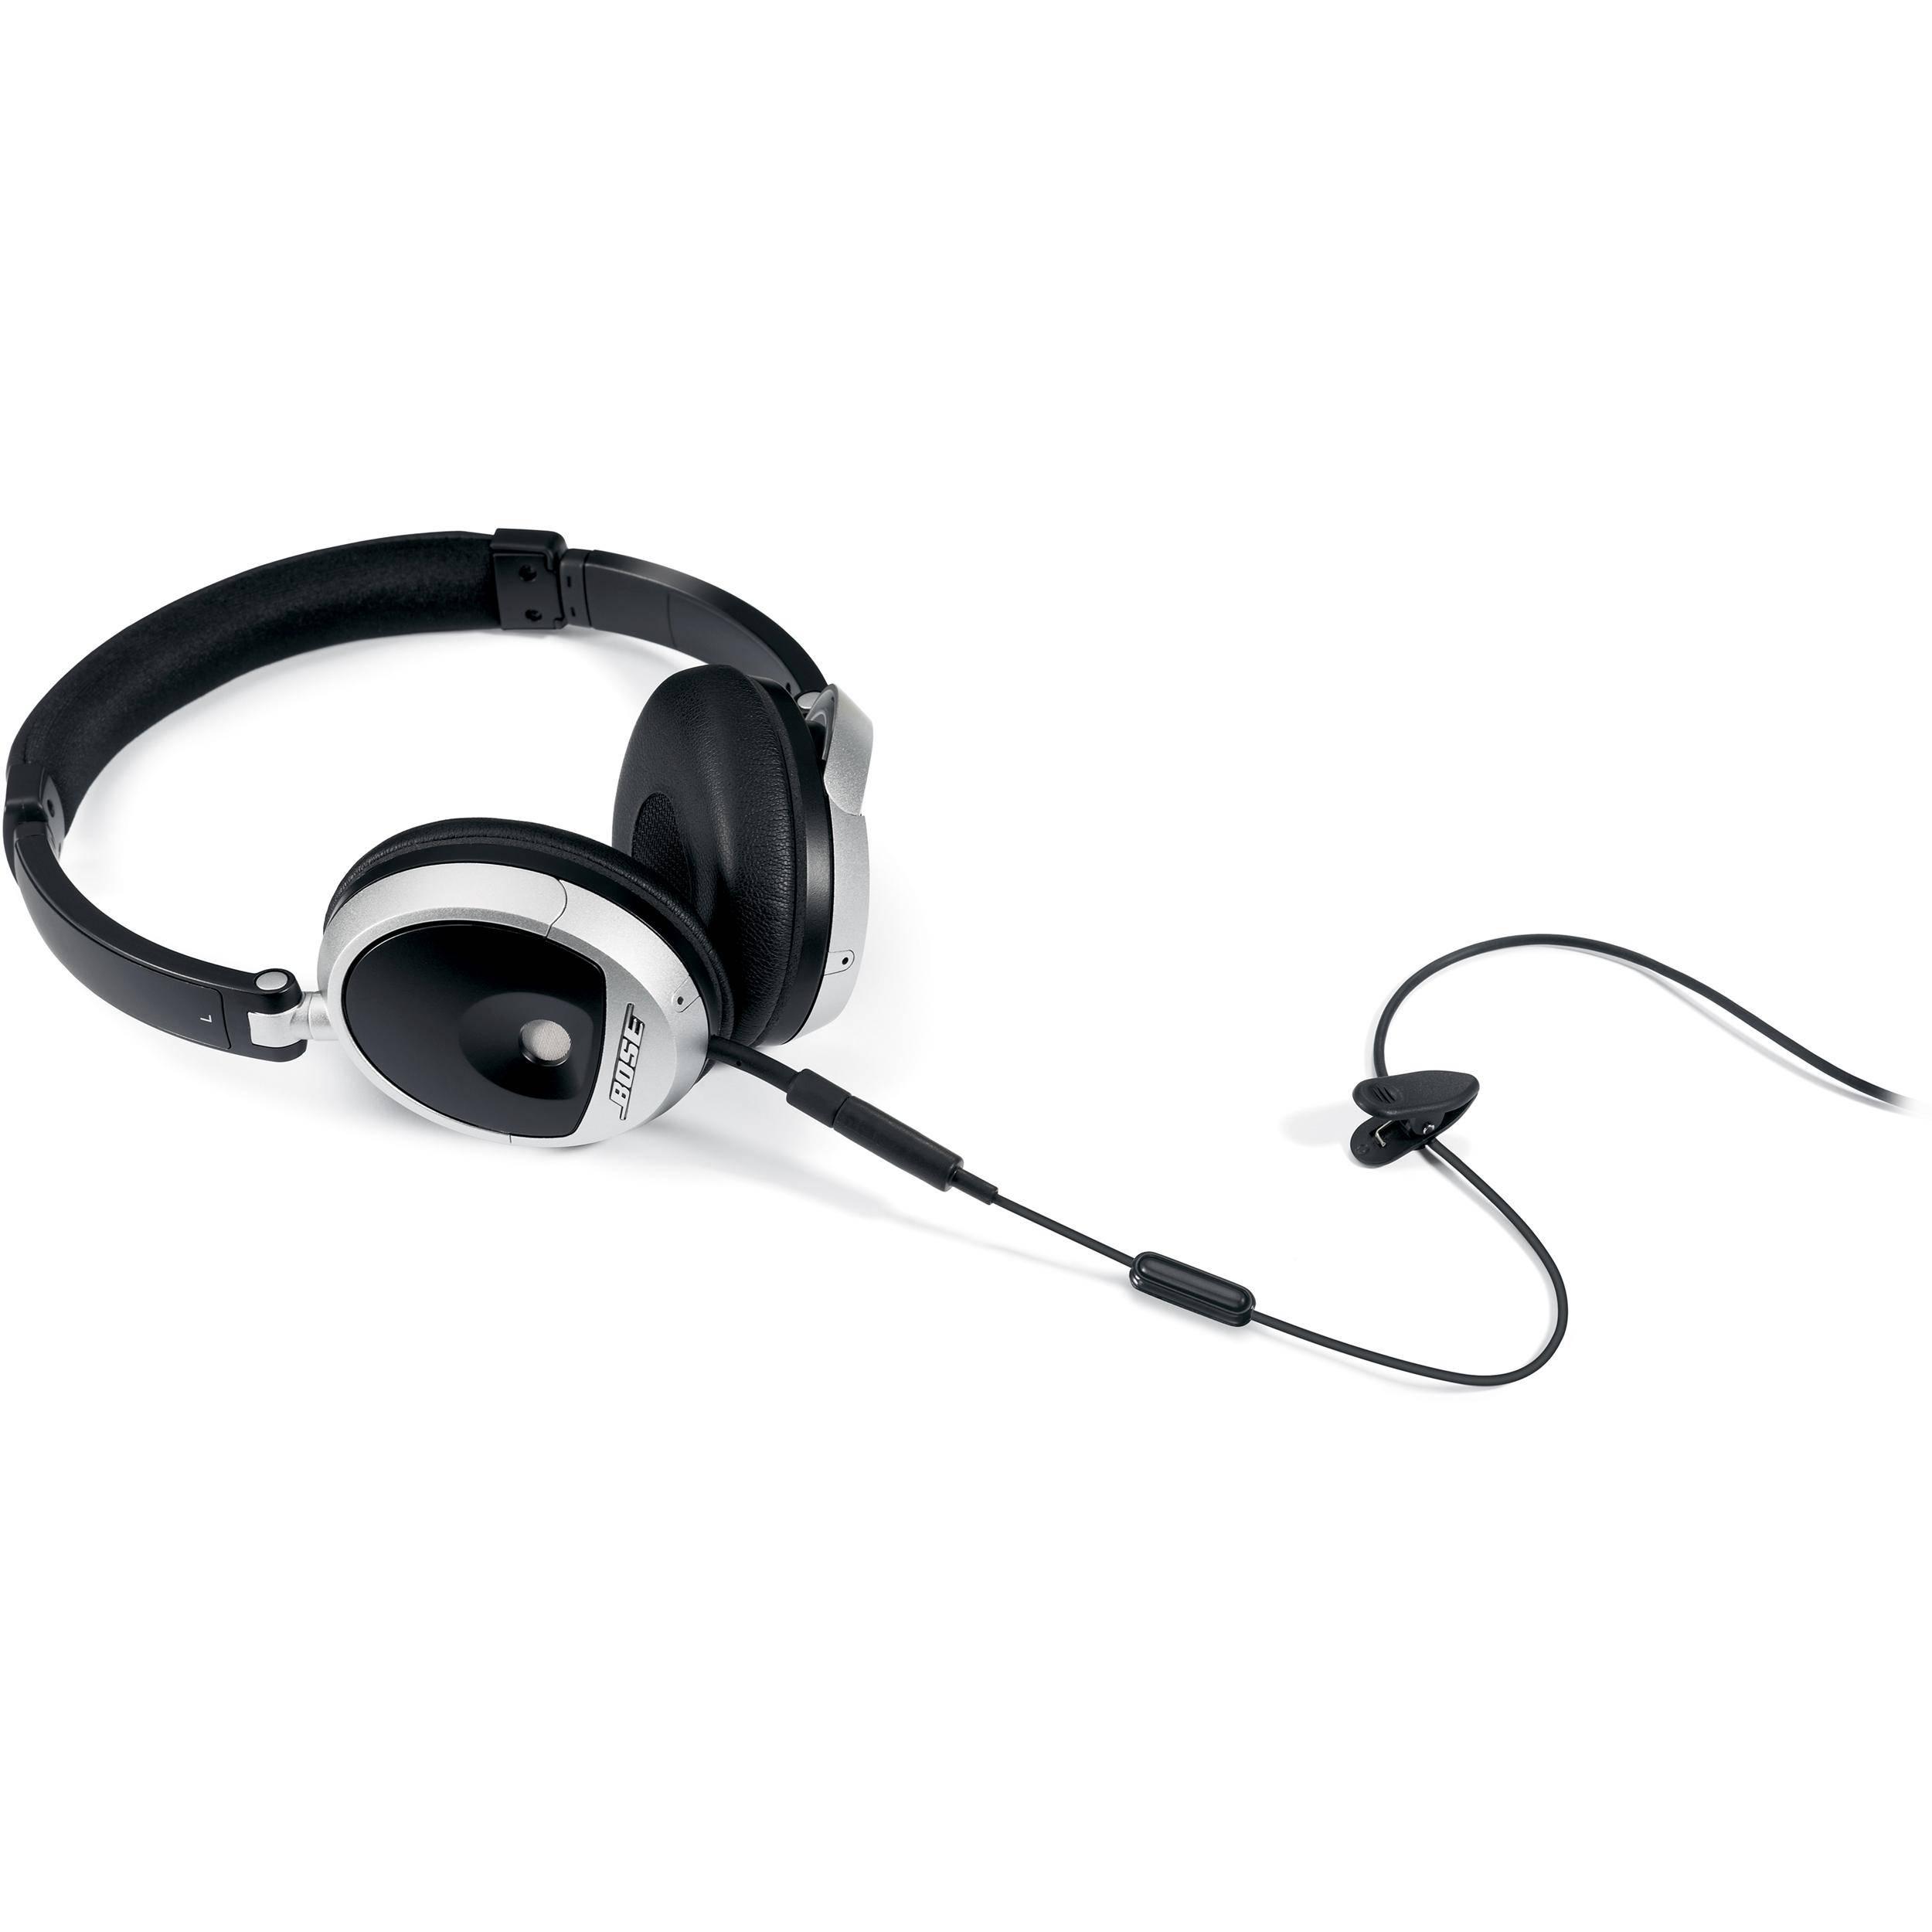 4005afa79cb Bose Mobile Headphones - Image Headphone Mvsbc.Org